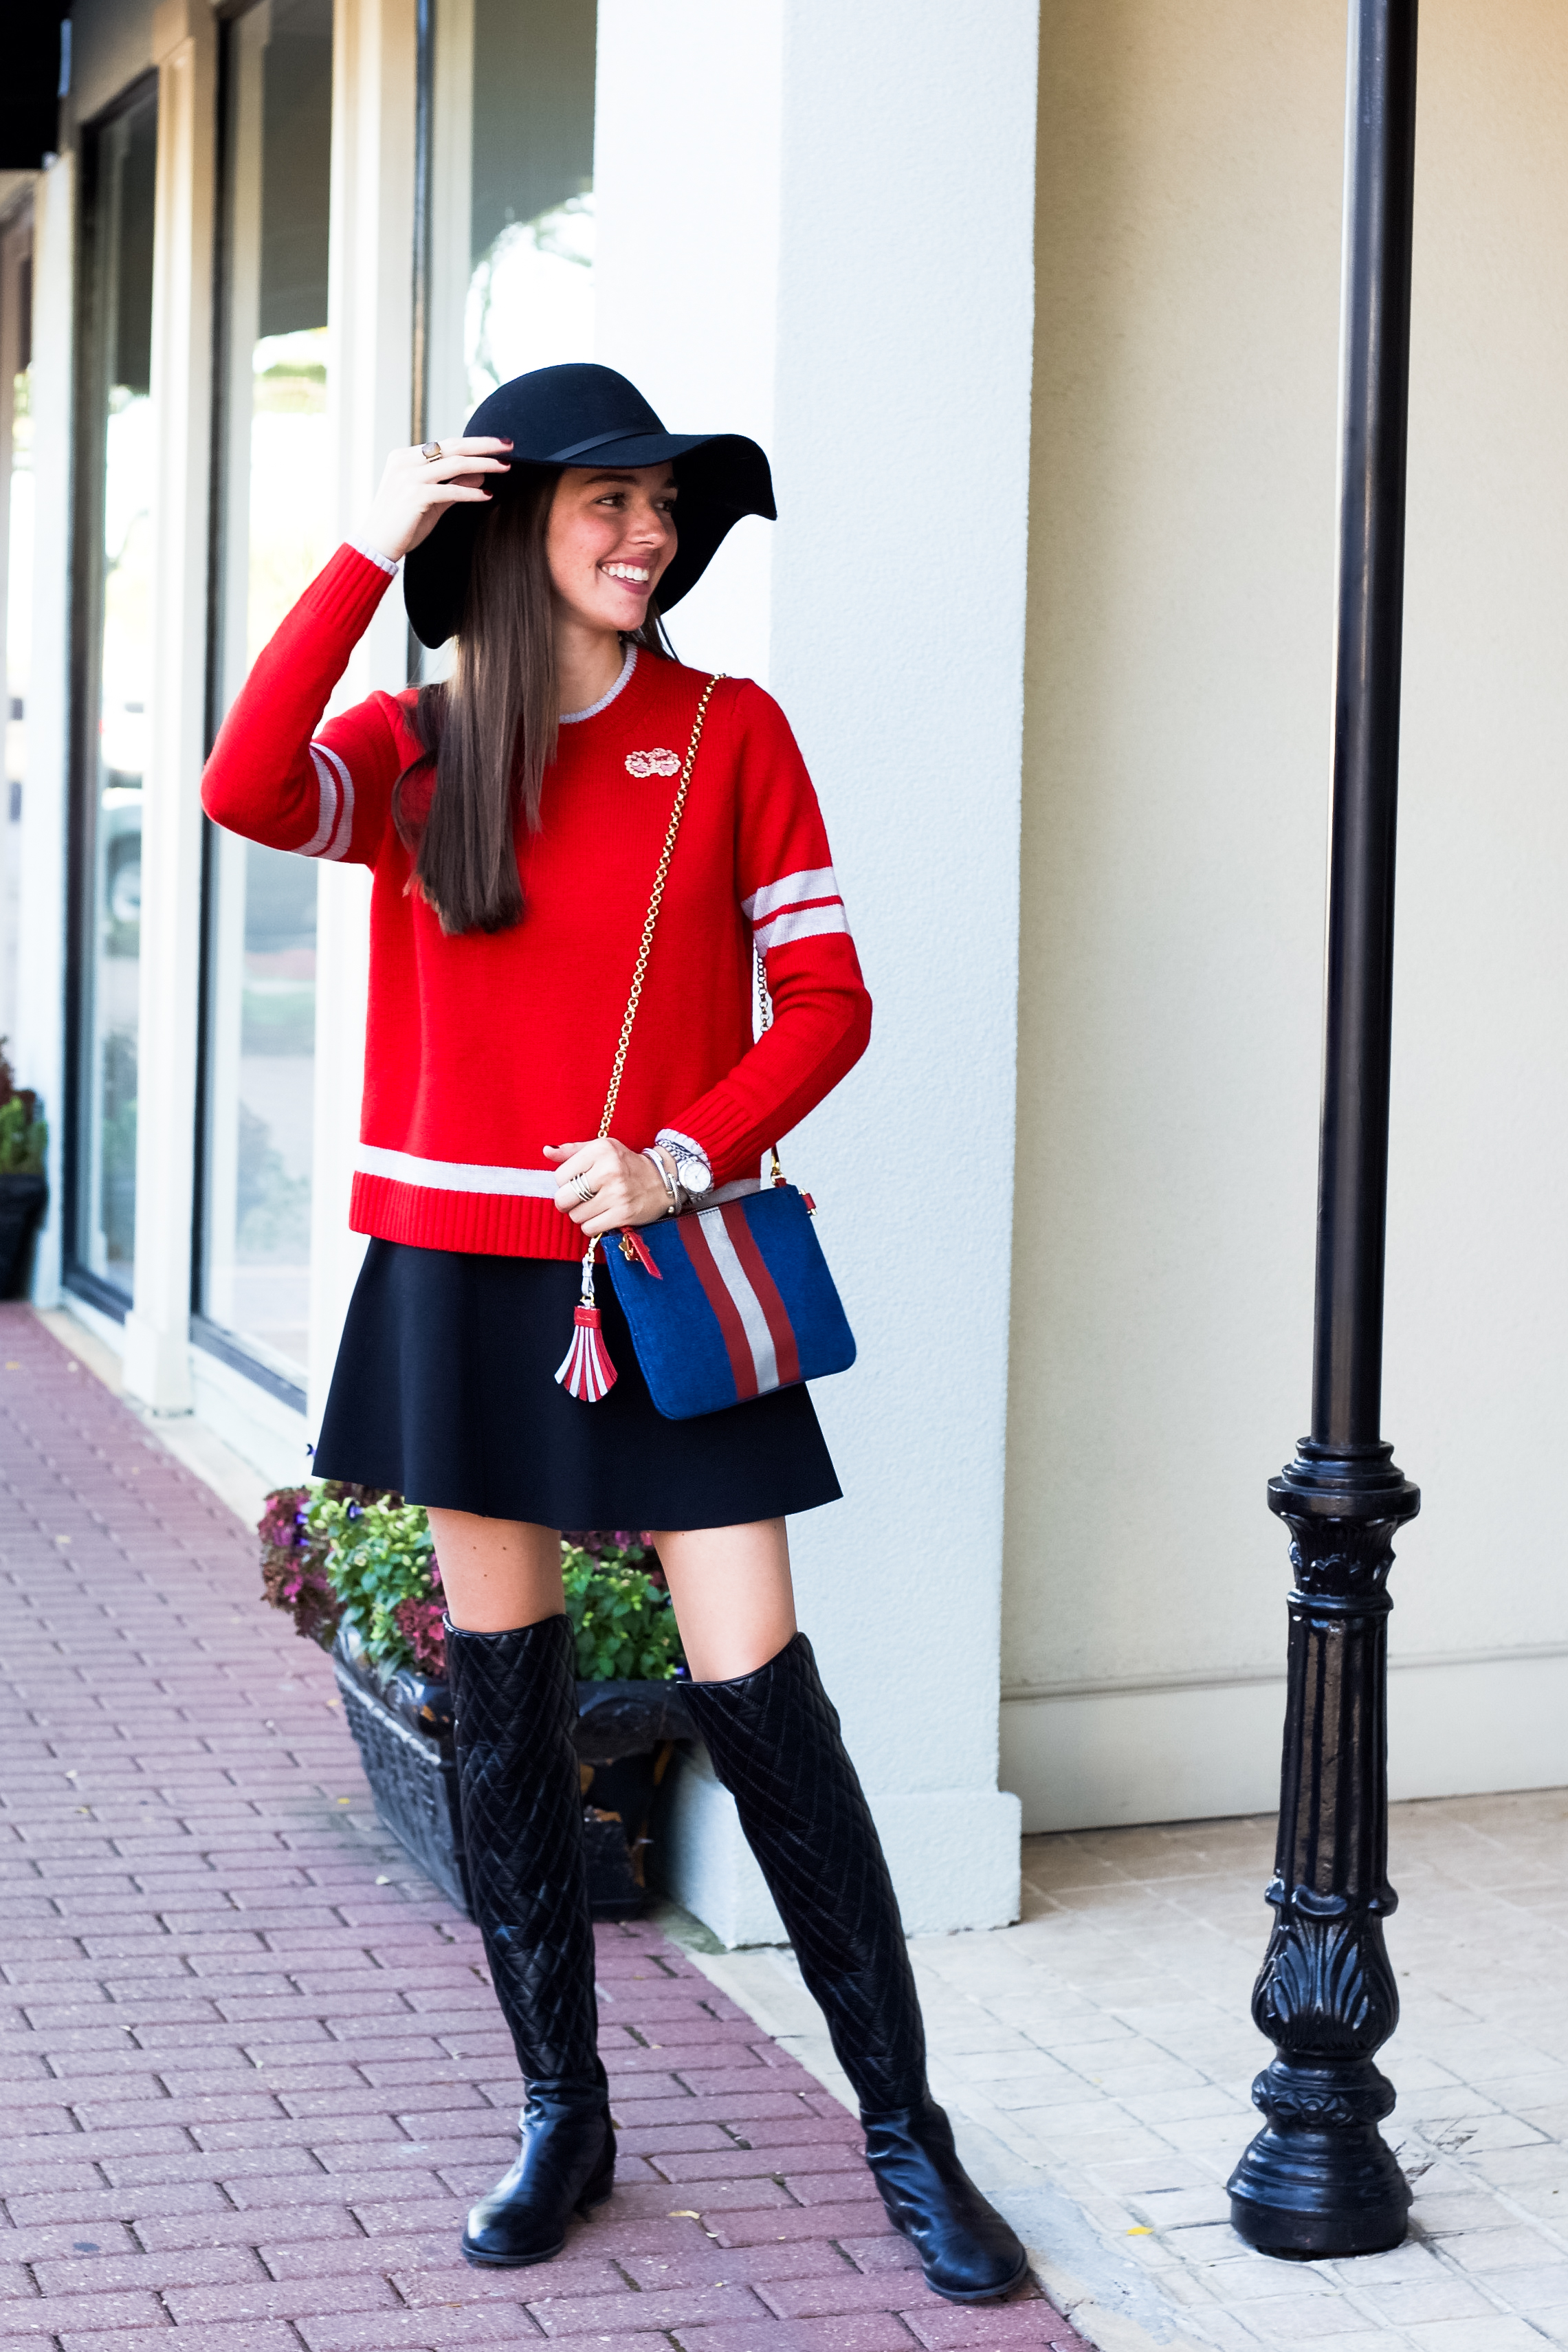 fashion-blogger-lcb-style-caroline-bramlett-draper-james-reese-witherspoon-fairhope-alabama-14-of-19